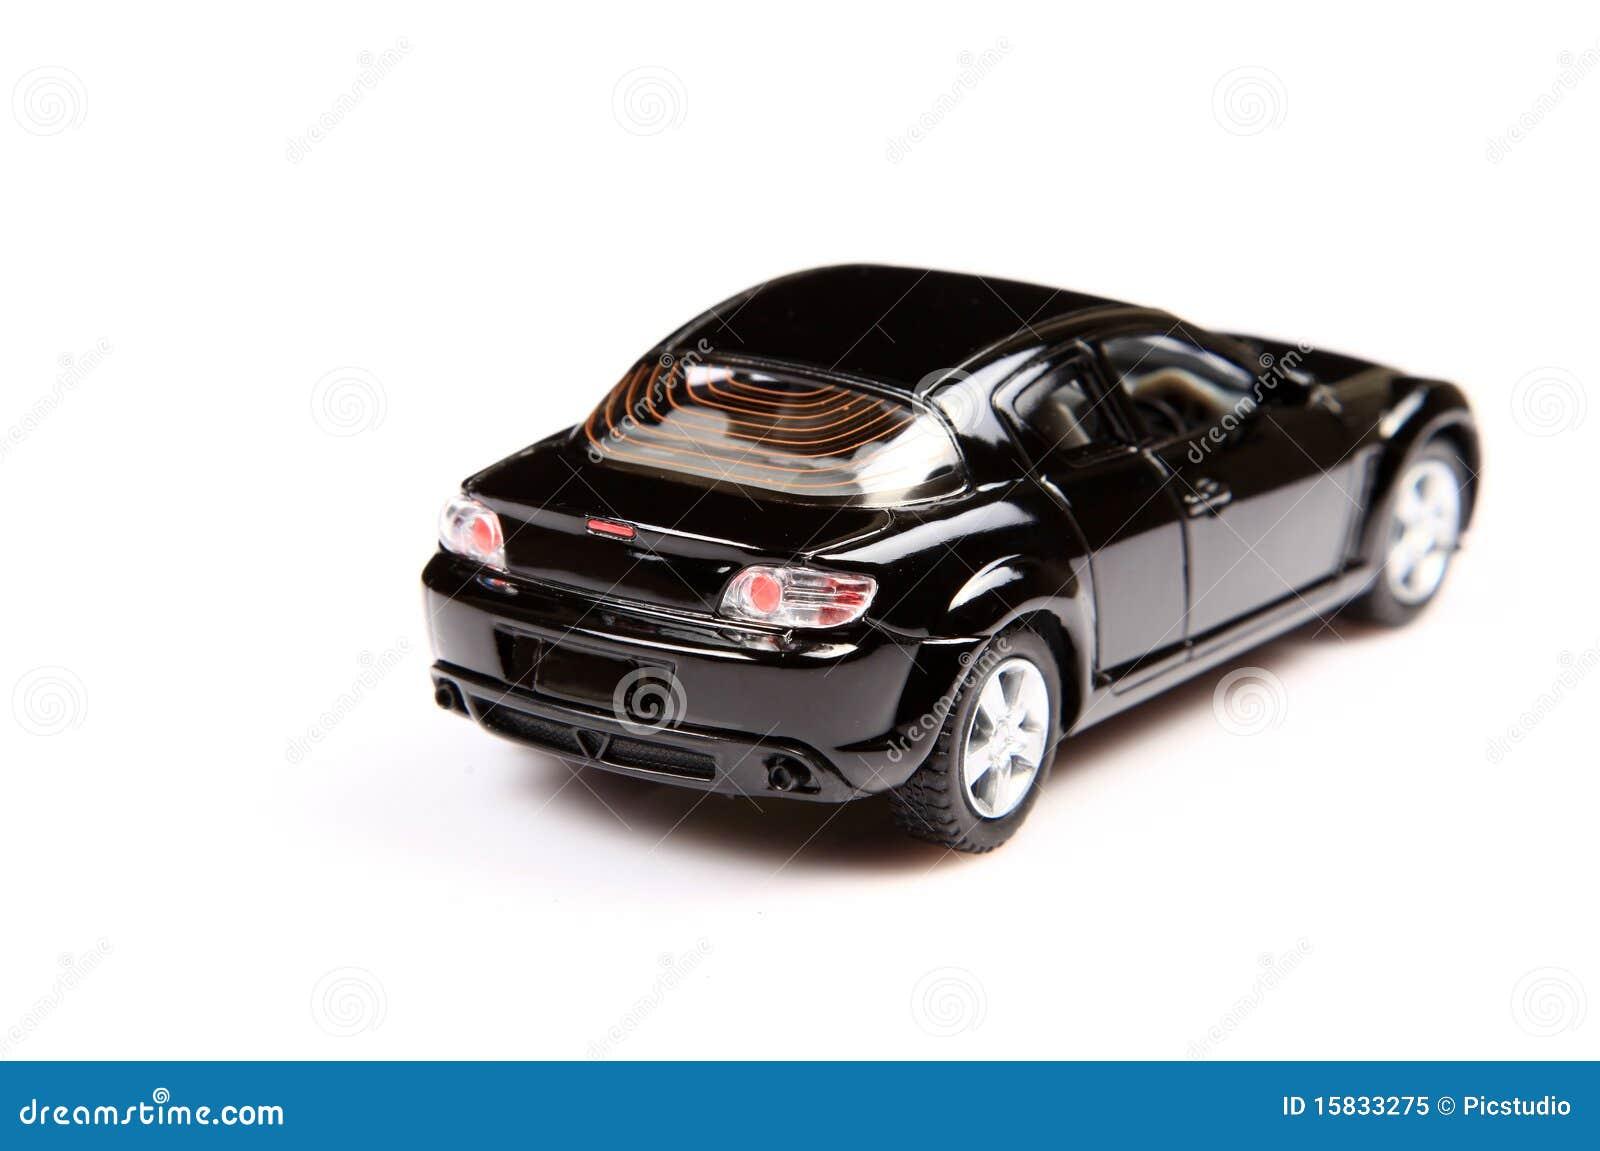 Sports car back